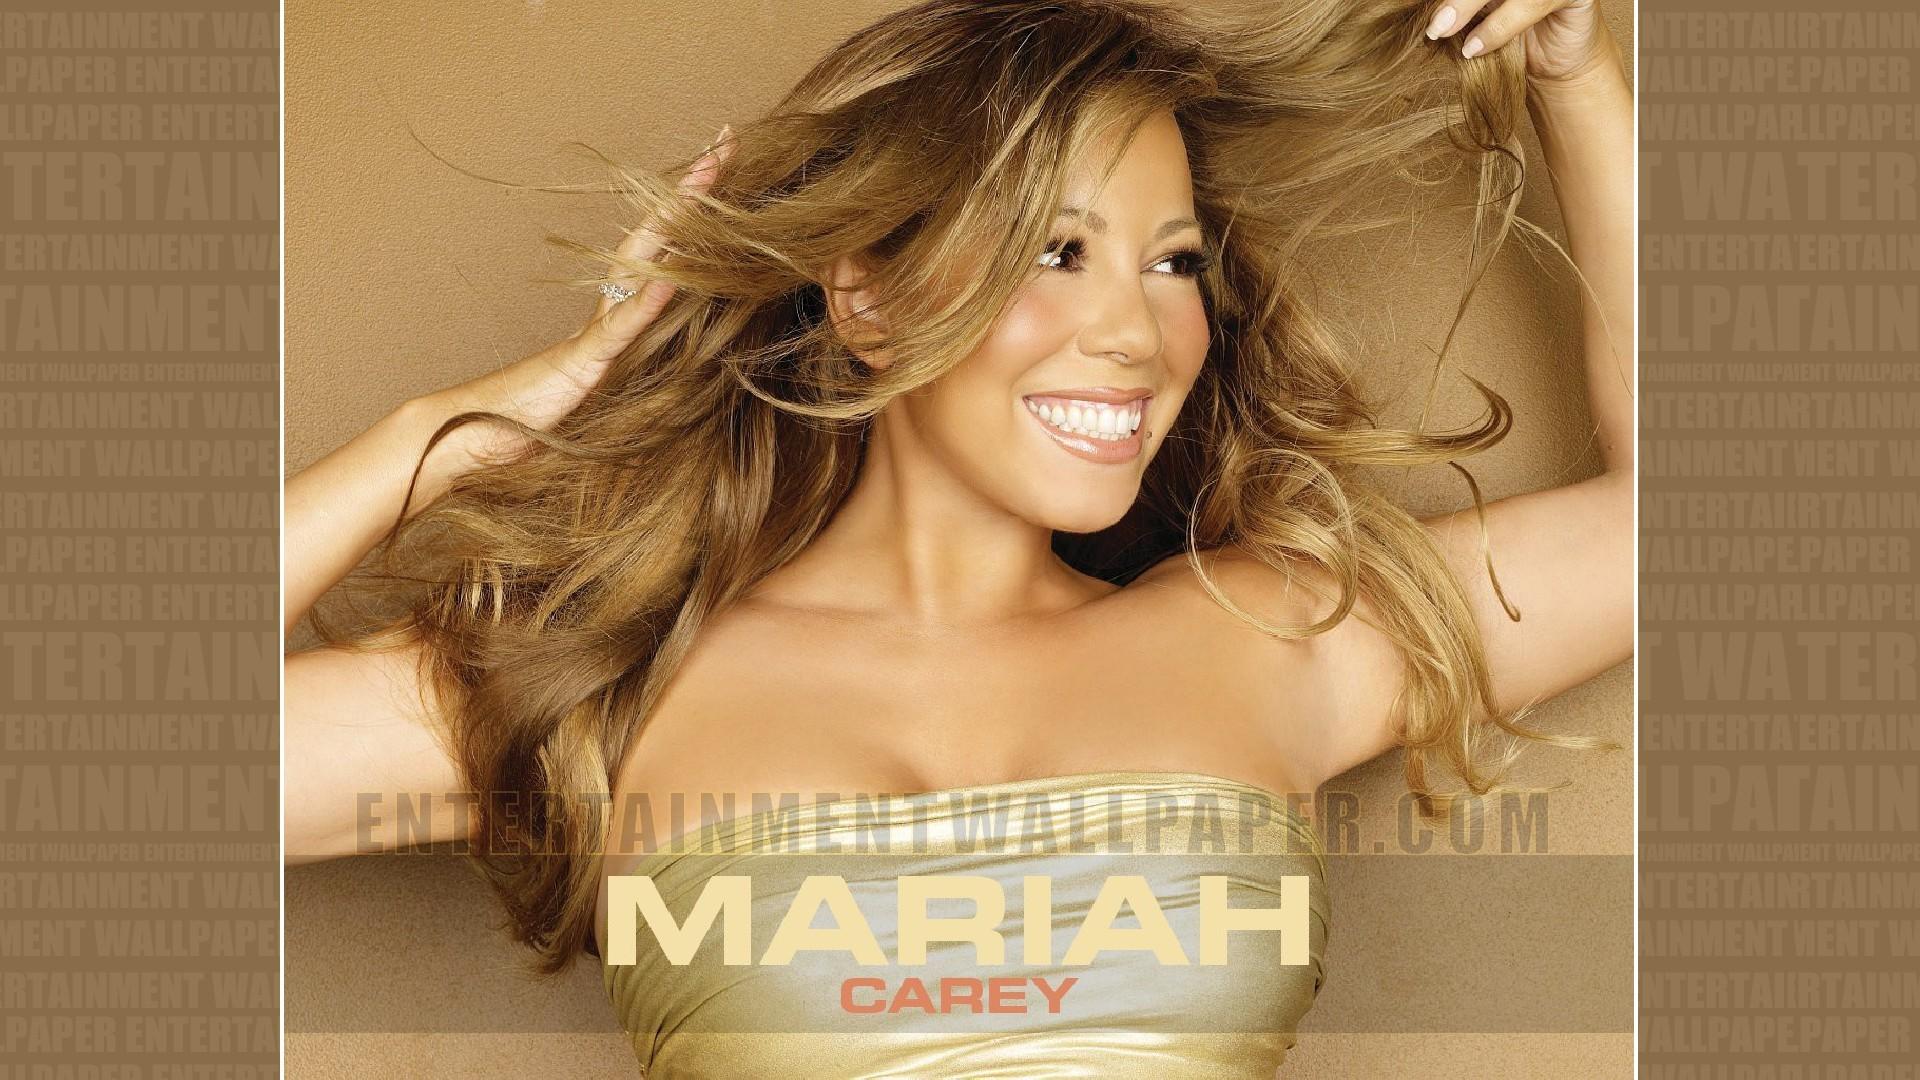 Mariah carey hot photo shoot Through the Rain - Wikipedia